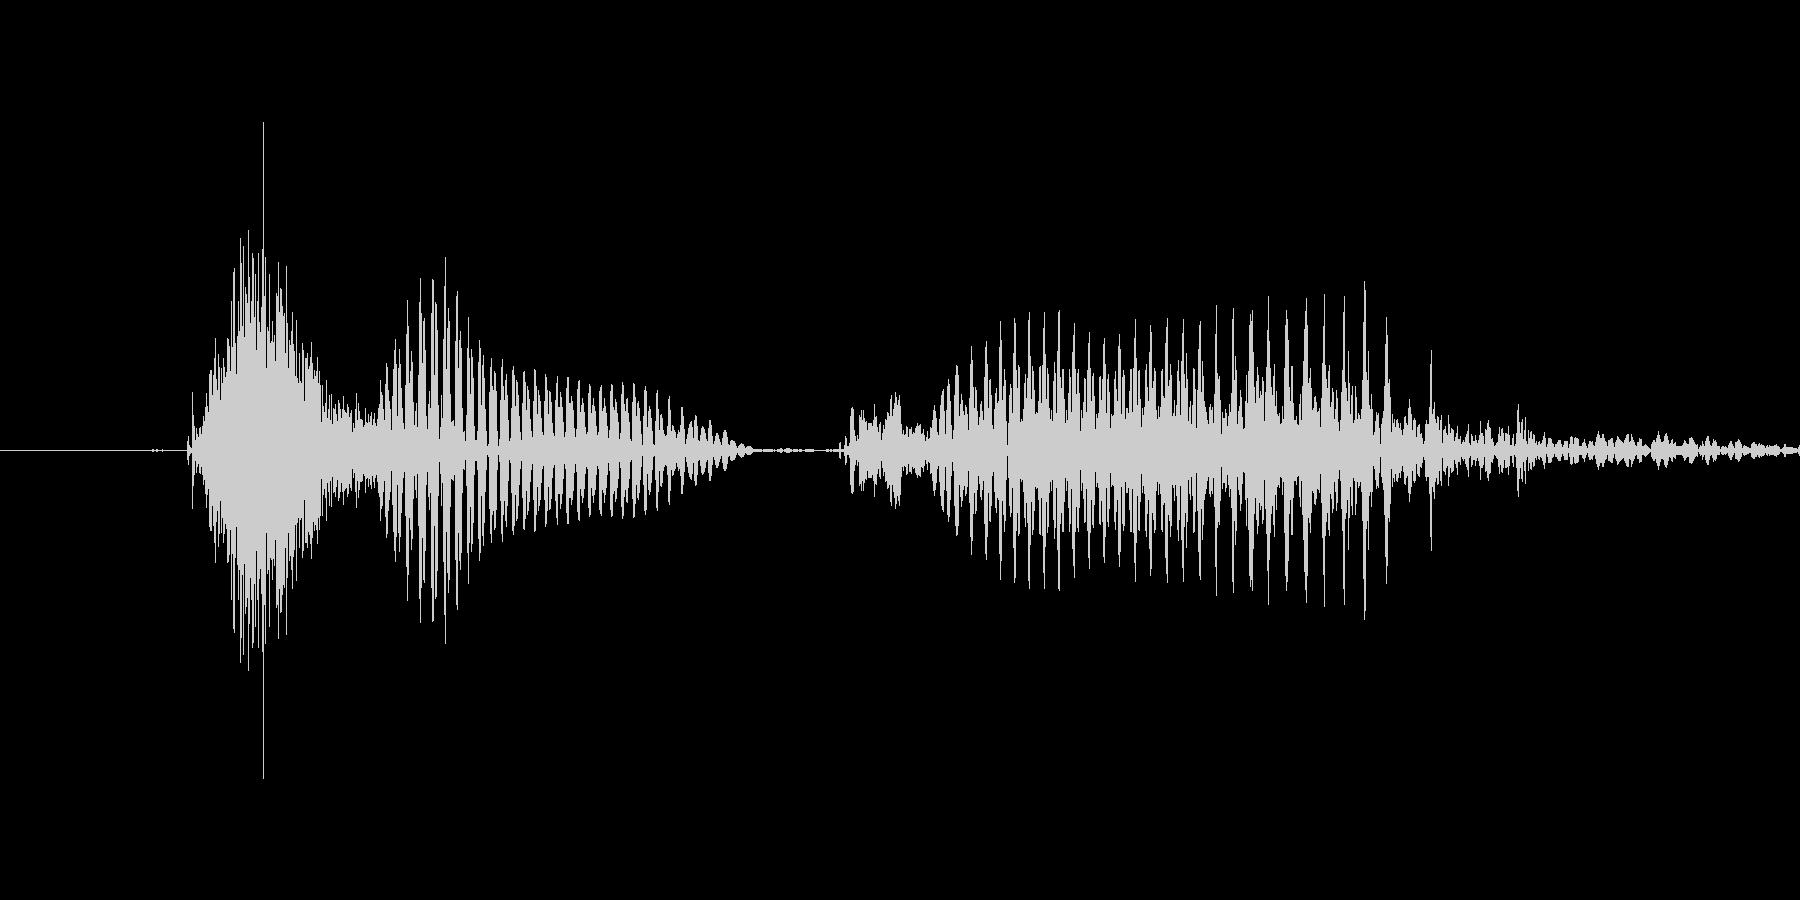 「2 PM」英語発音の未再生の波形